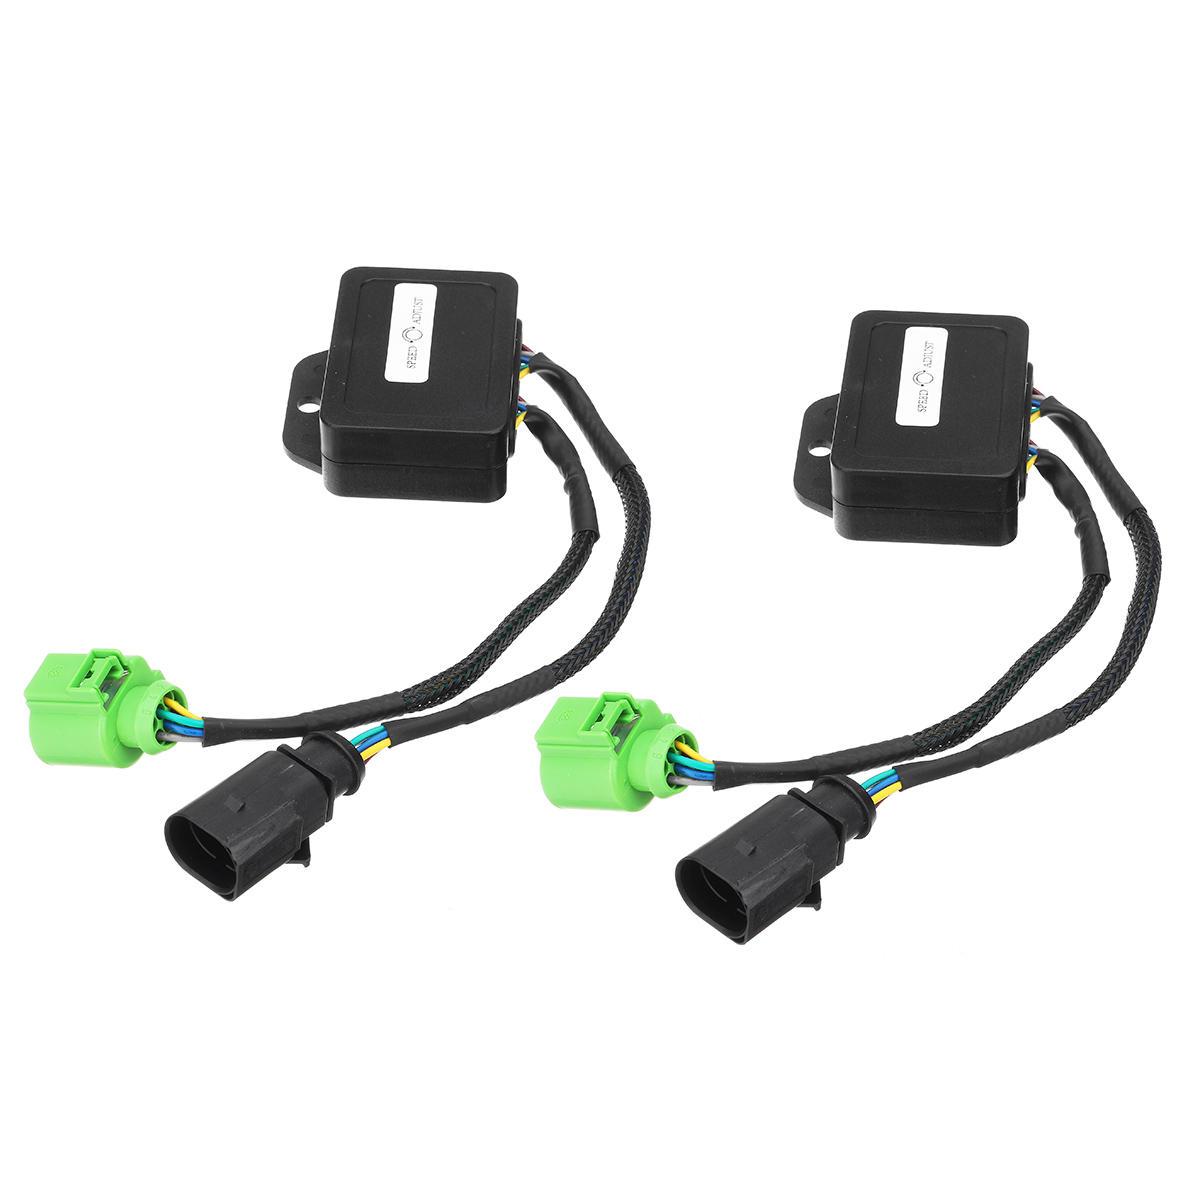 2Pcs Car Turn Signal Indicator Light LED Tail Light Line Resistance Controller for Audi A4 S4 B8